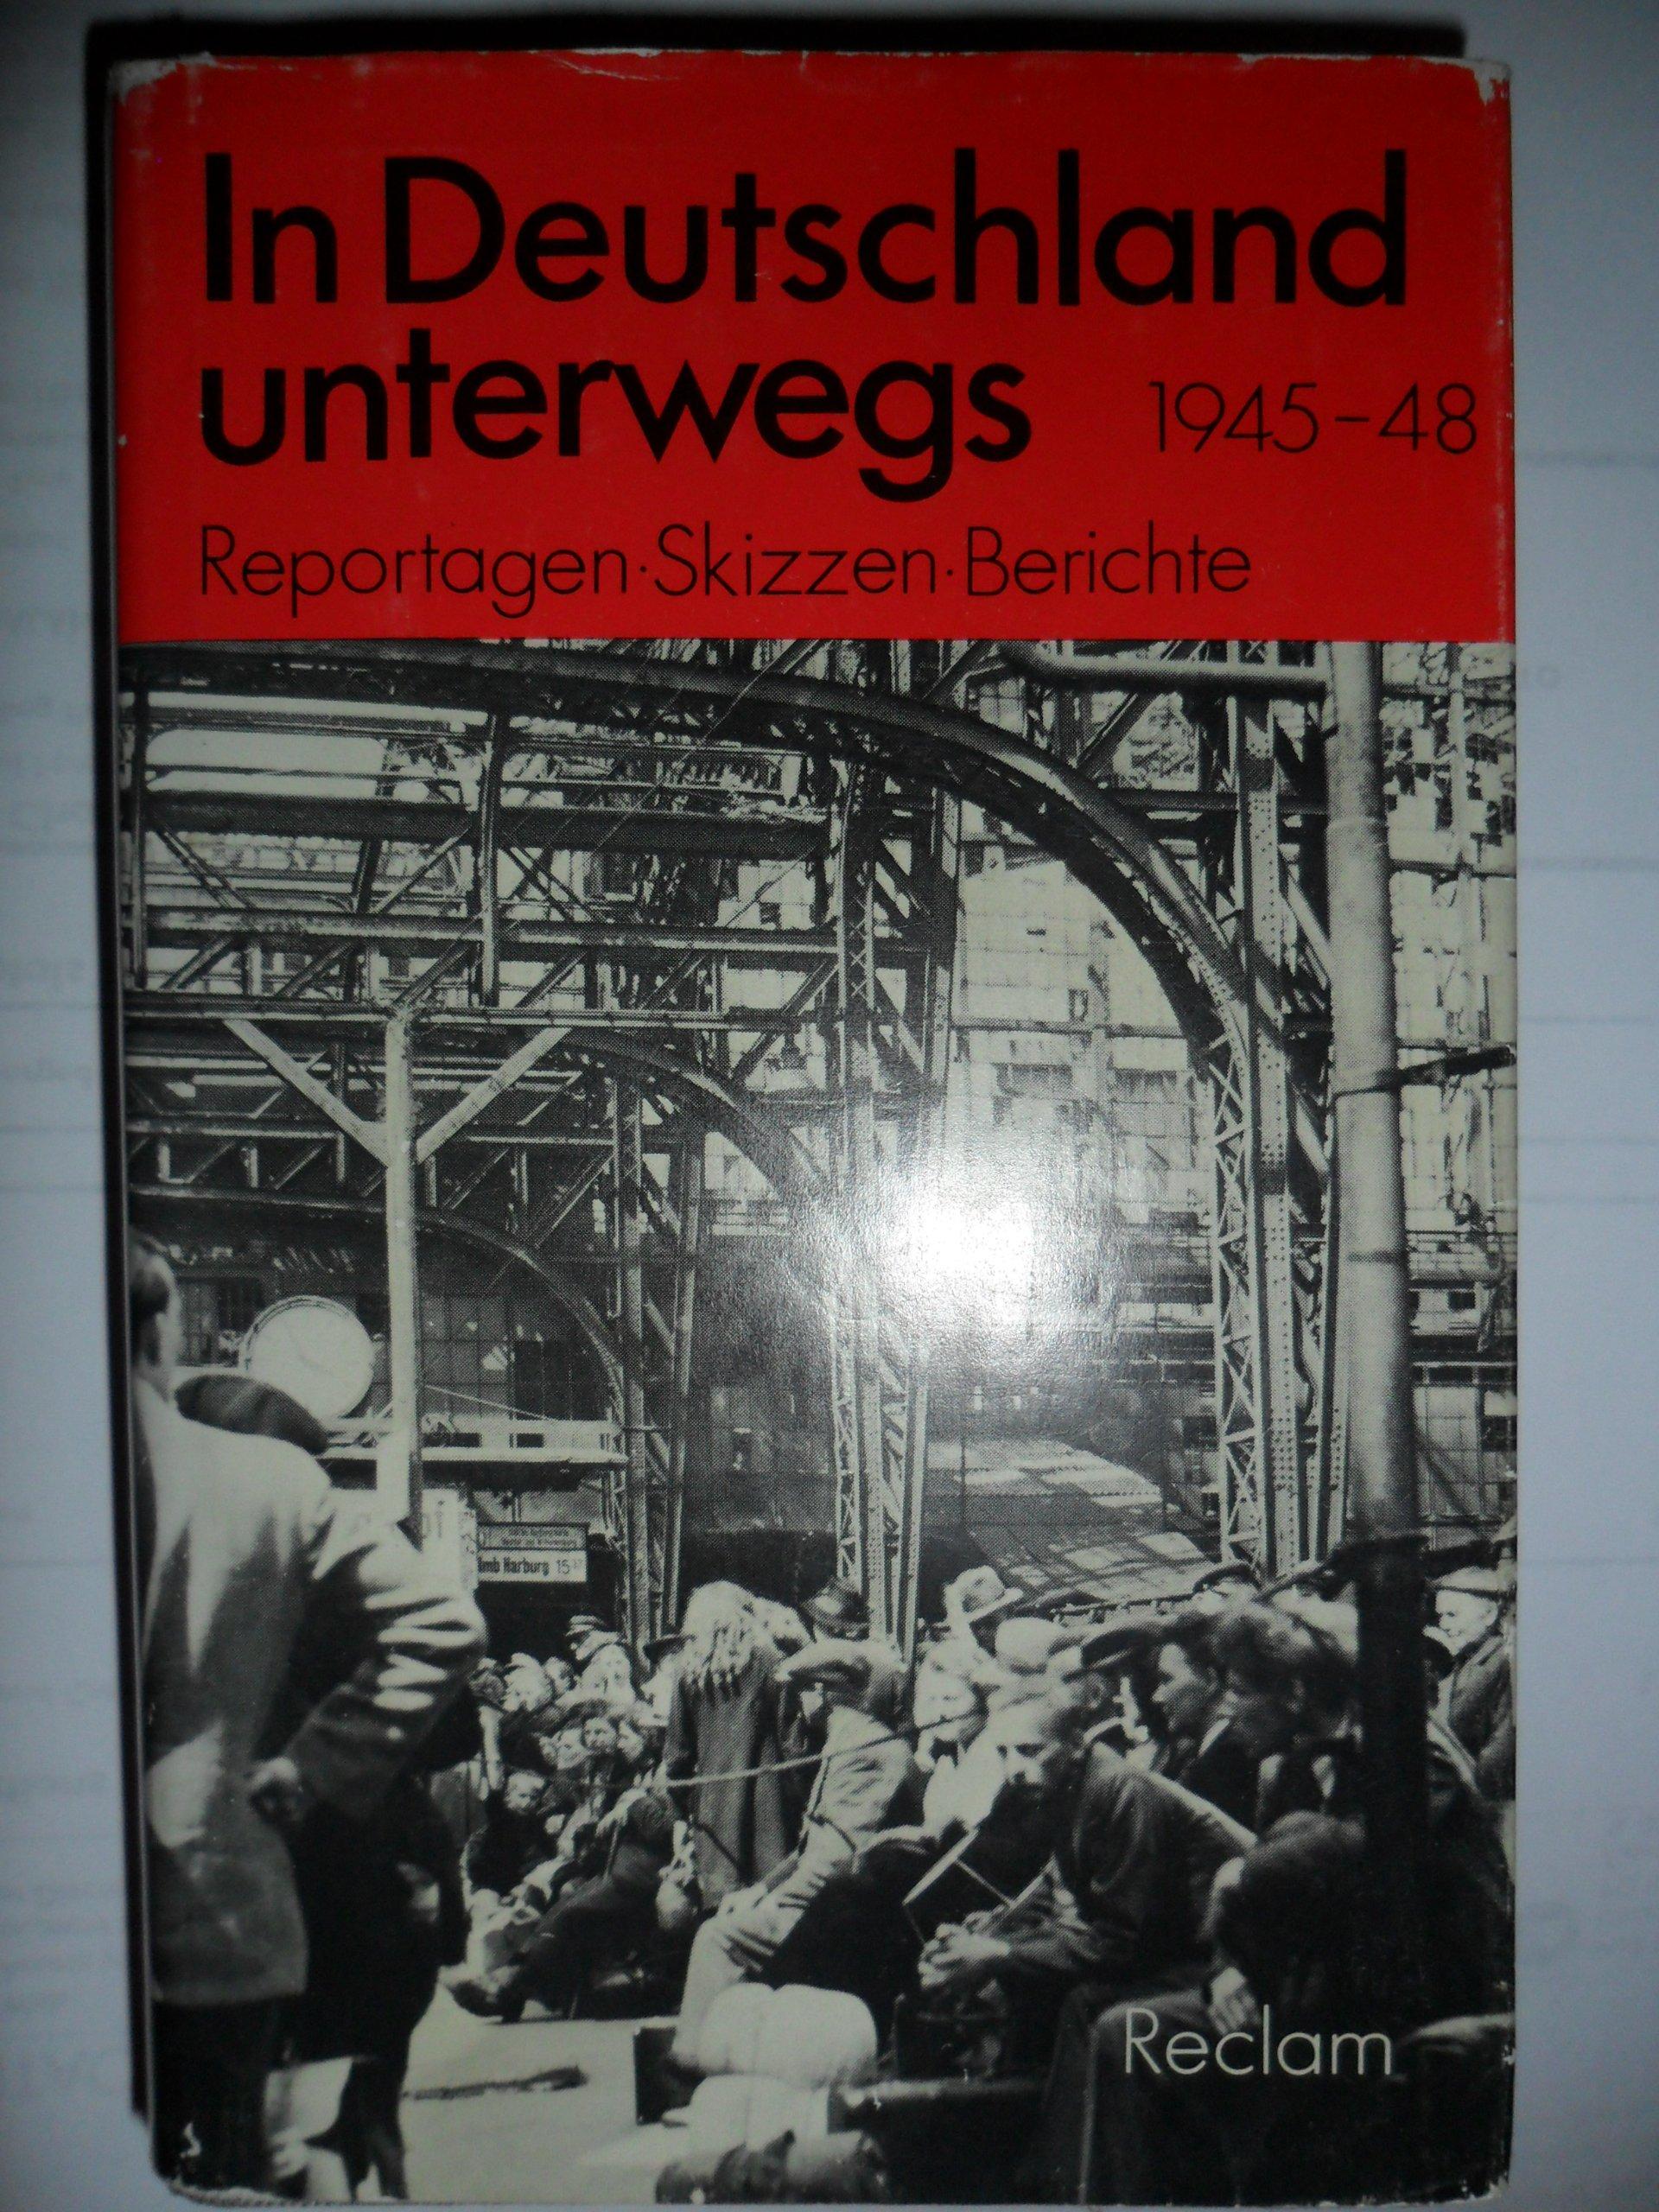 In Deutschland unterwegs. Reportagen, Skizzen, Berichte 1945-1948